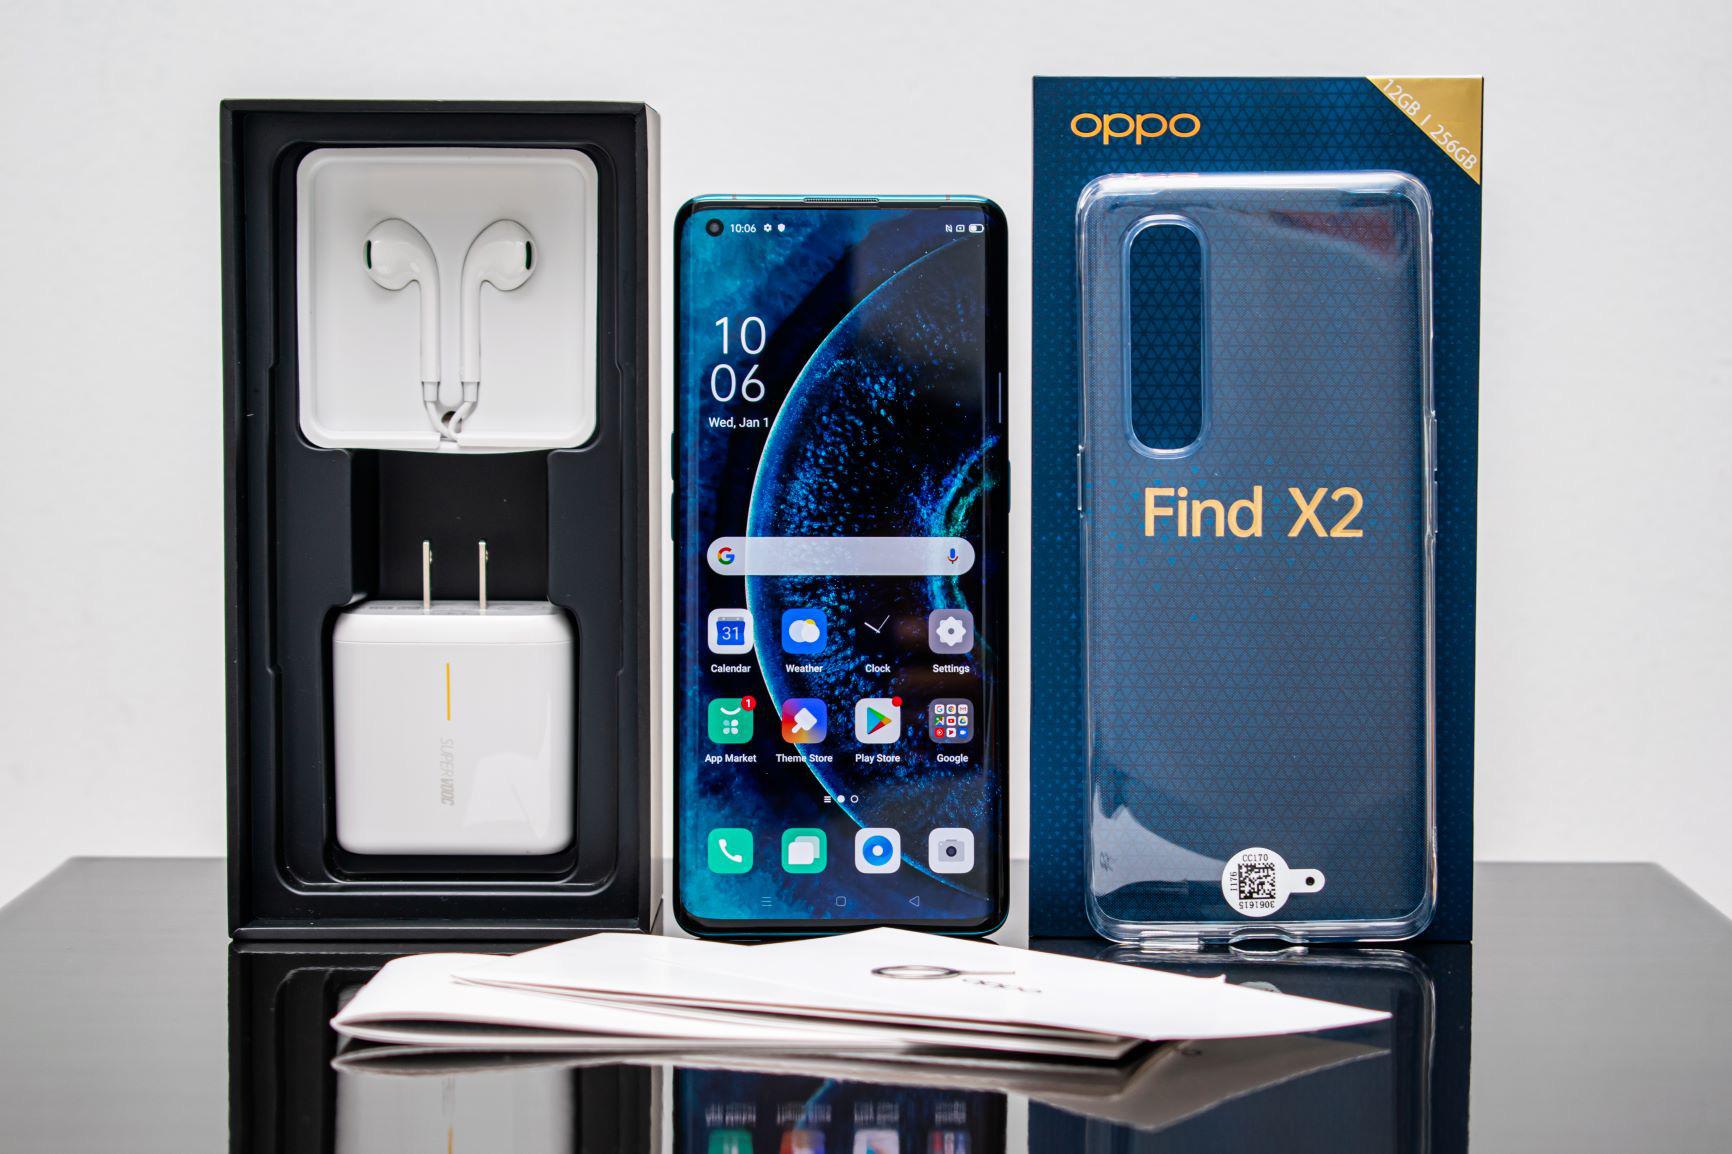 Có nên mua Oppo Find X2? - Ảnh 6.